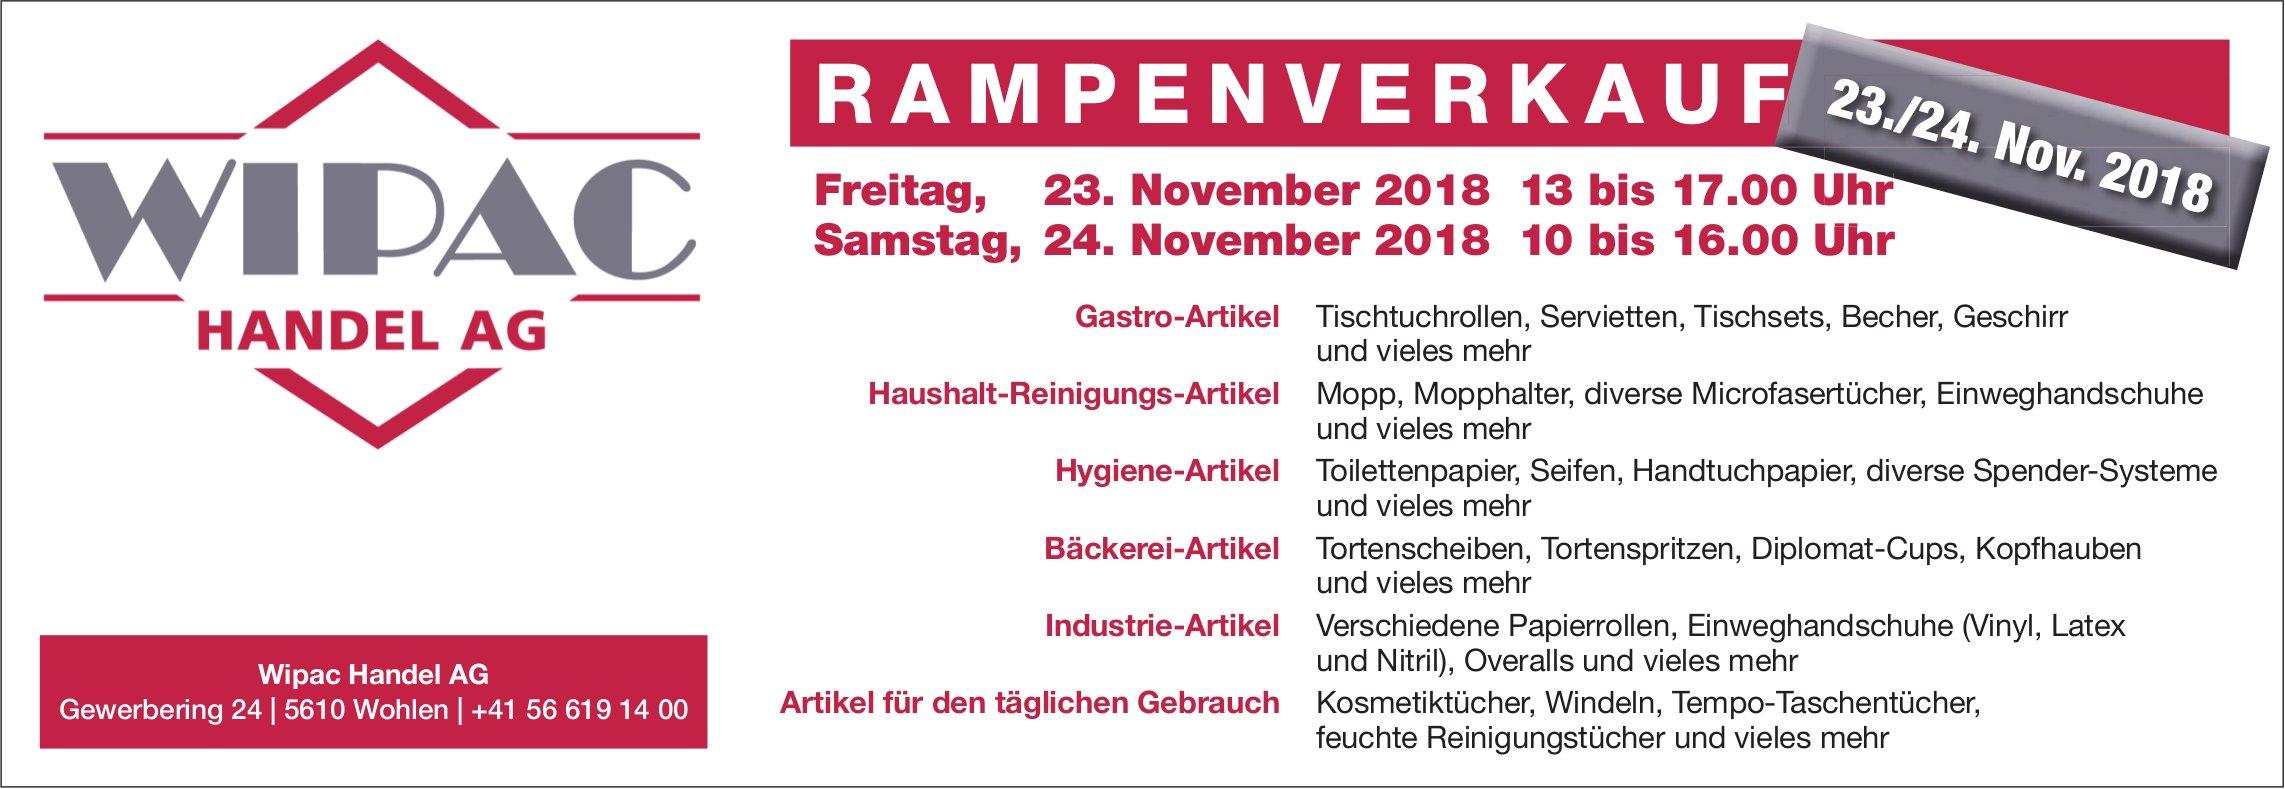 Rampenverkauf, 23./24. Nov., Wipac Handel AG